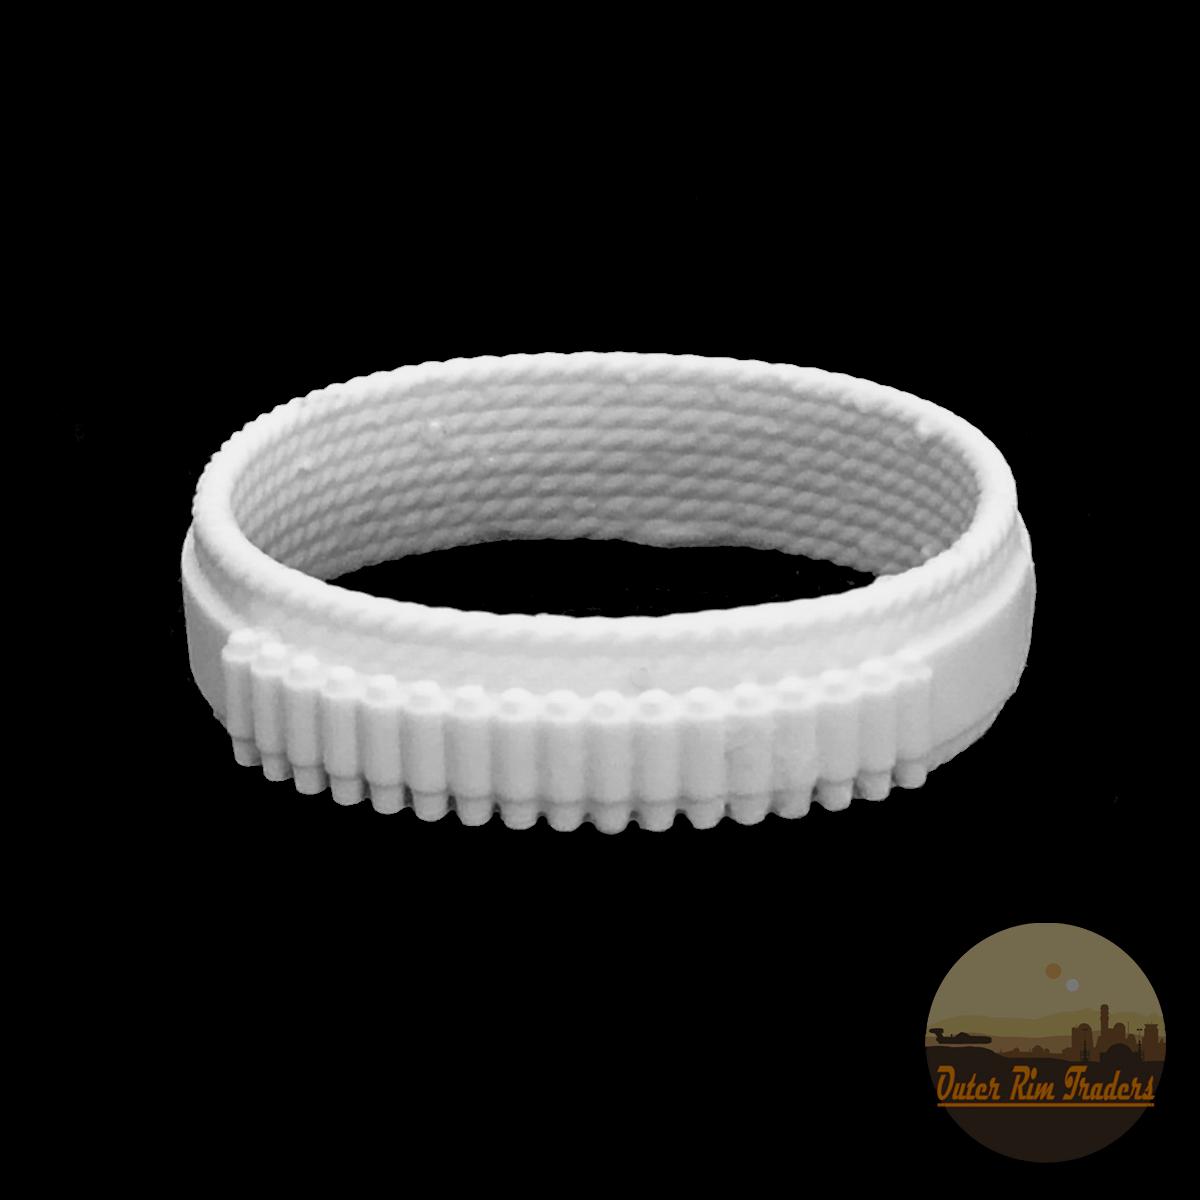 Image of Ammo belt in flex resin